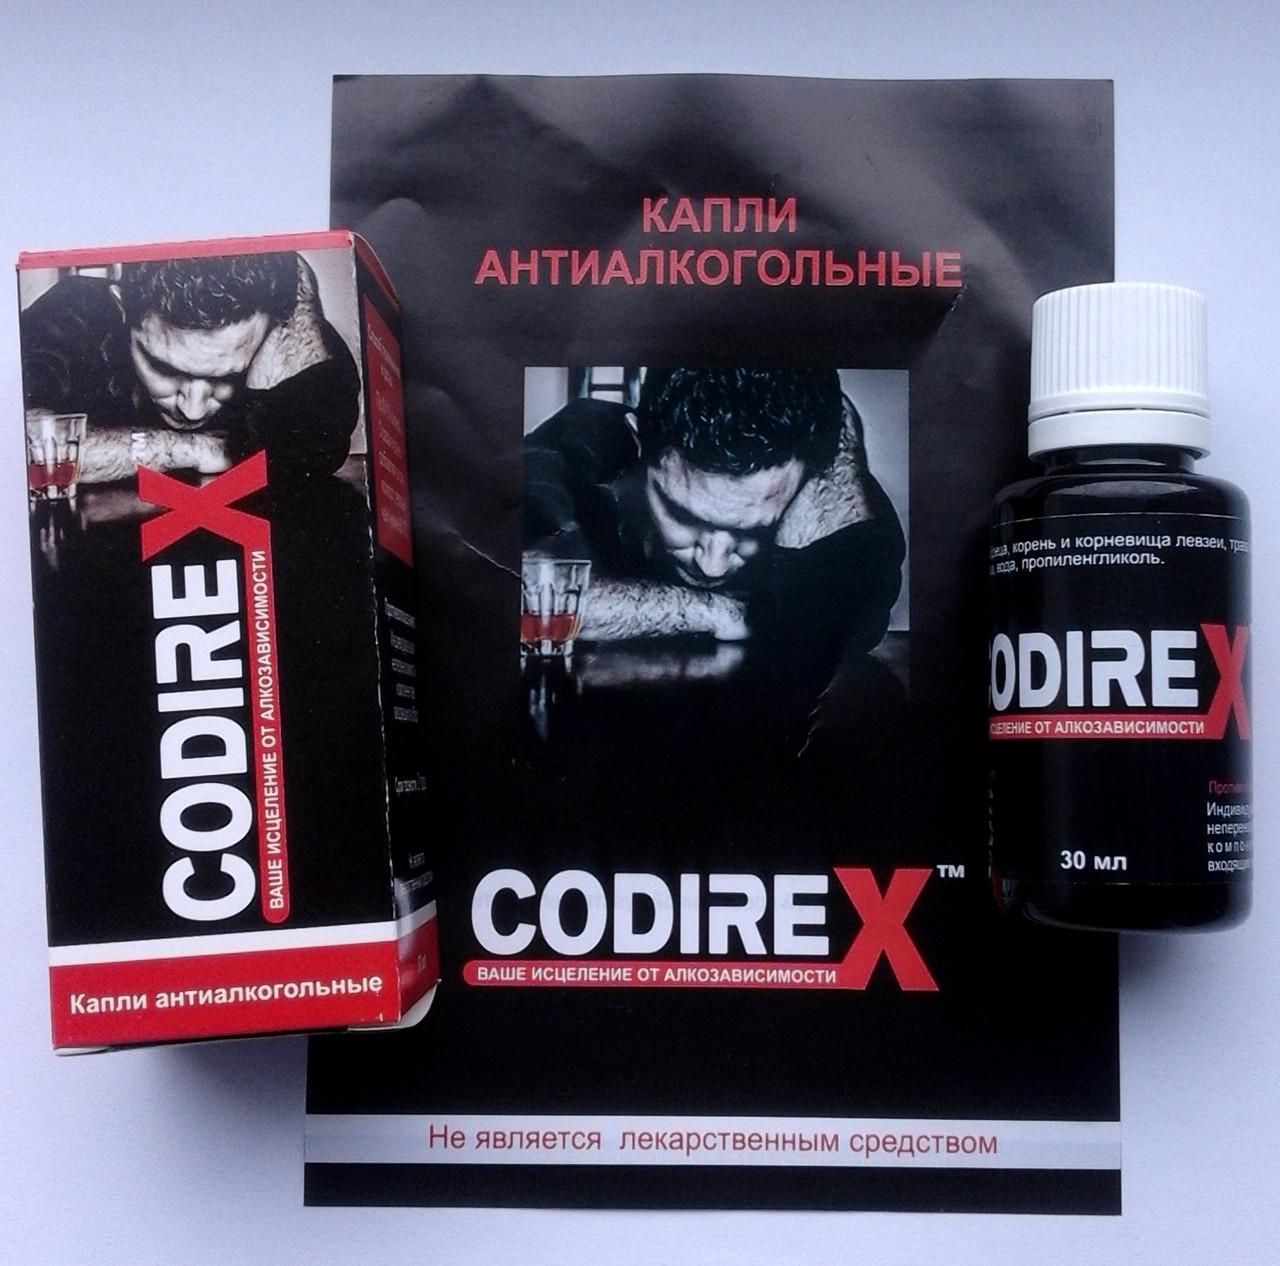 Codirex - Капли от алкоголизма (Кодирекс) - ОРИГИНАЛ